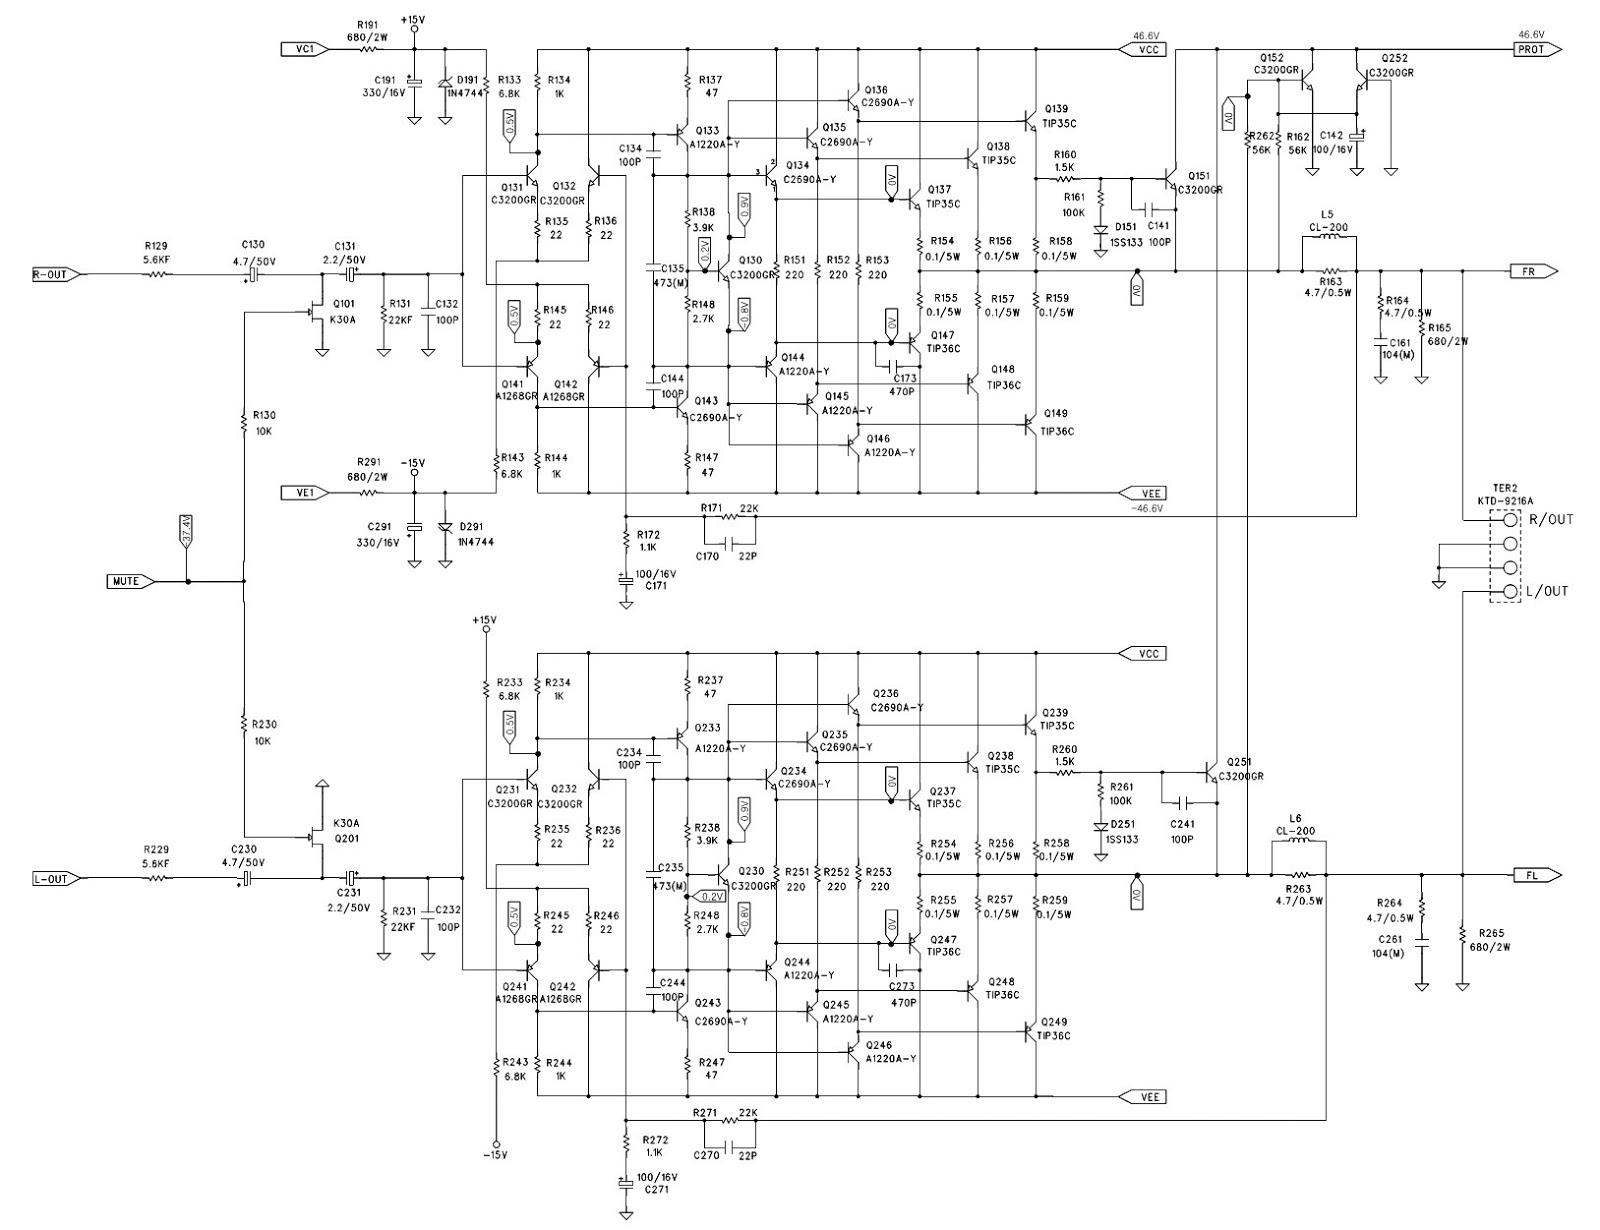 jbl px 600 2 2 channel car amplifier mosfet output circuit rh electronicshelponline blogspot com JBL Amplifier P180 2 Amp Wiring Diagram